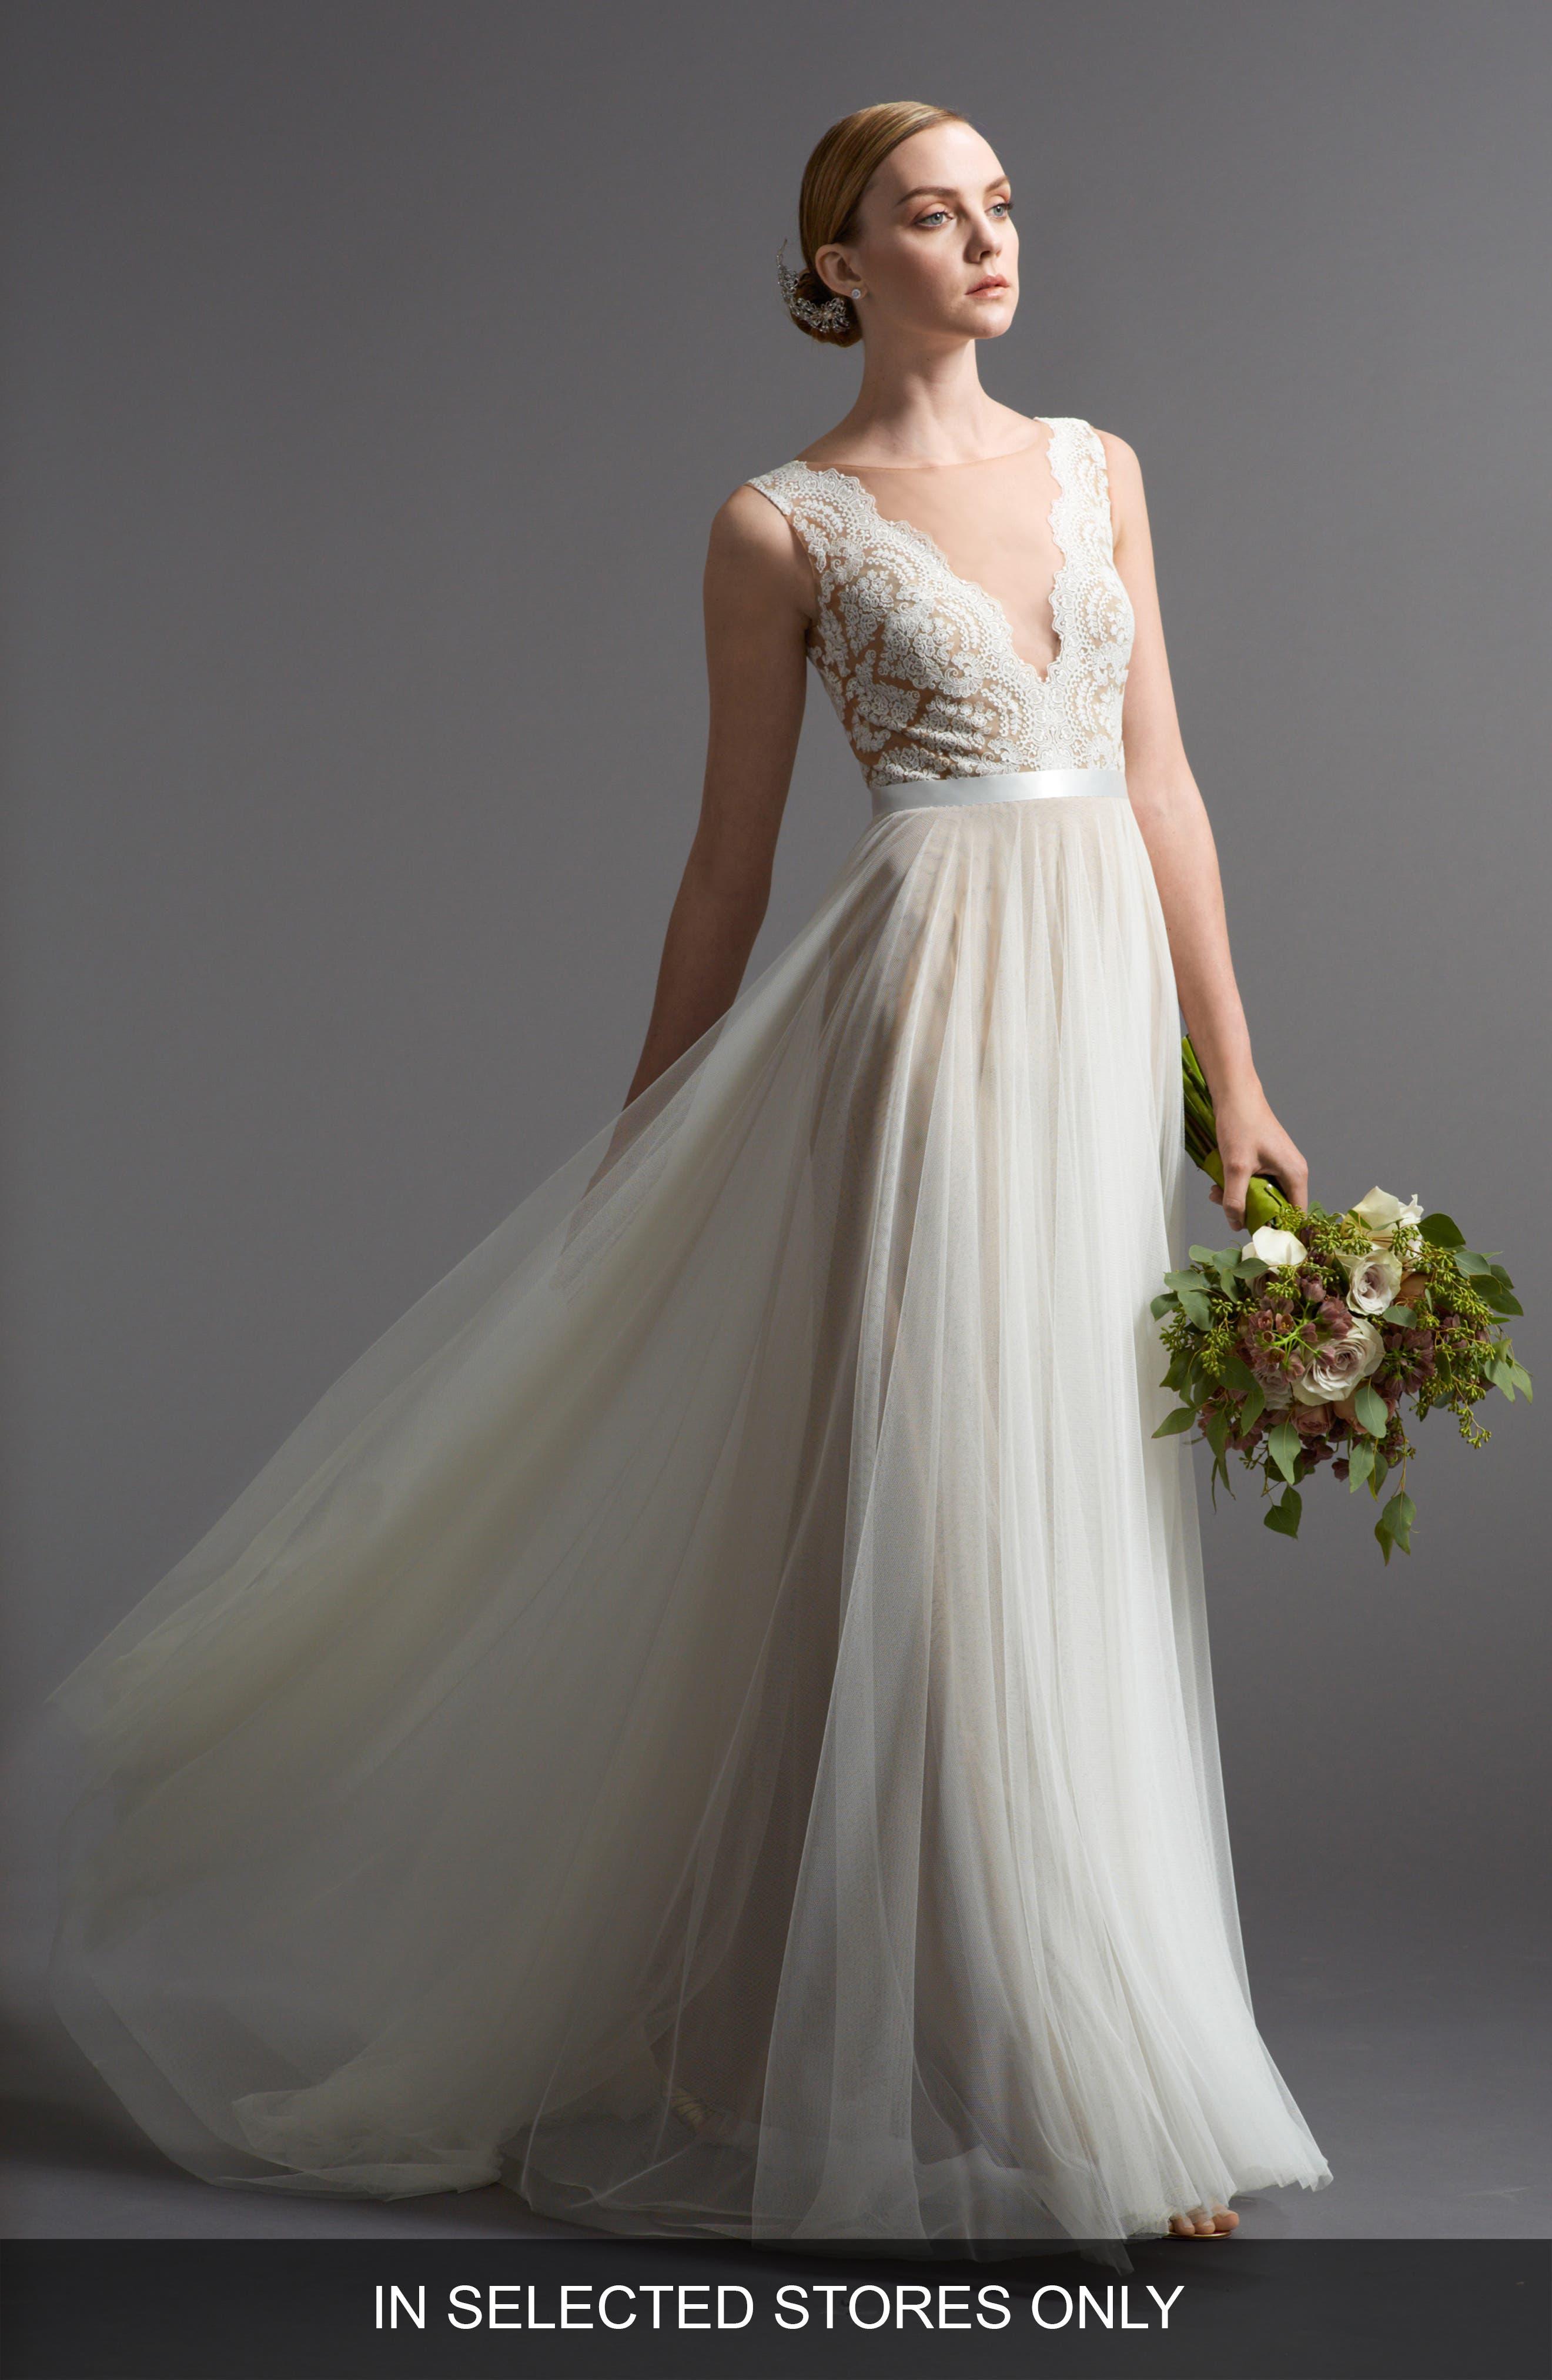 Santina Lace Bodice A-Line Gown,                         Main,                         color, Nude/Ivory/Bronze/Gardenia